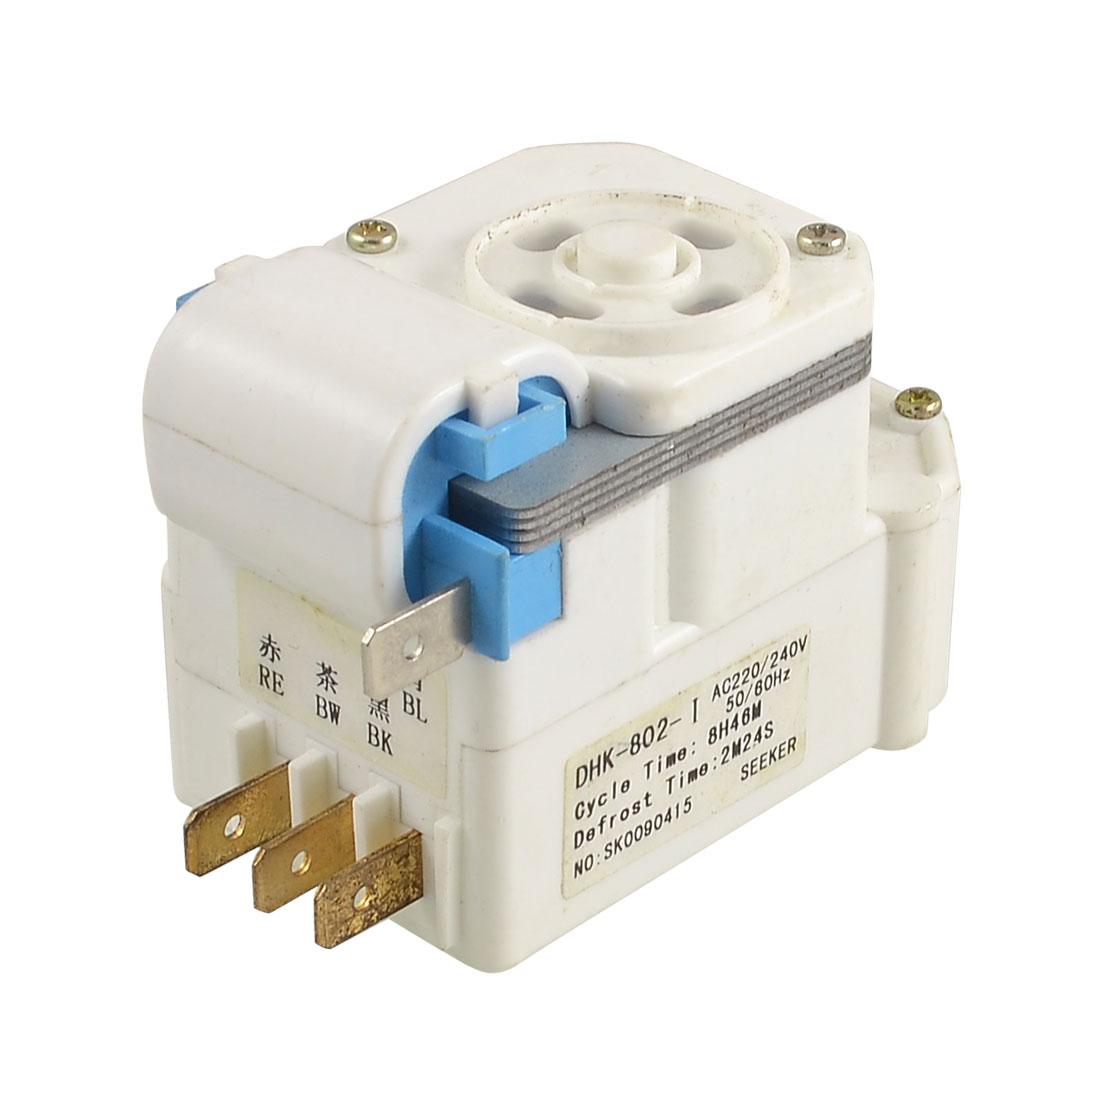 AC 220/240V 50/60Hz DBY Series 4 Terminals Refrigerator Defrost Timer